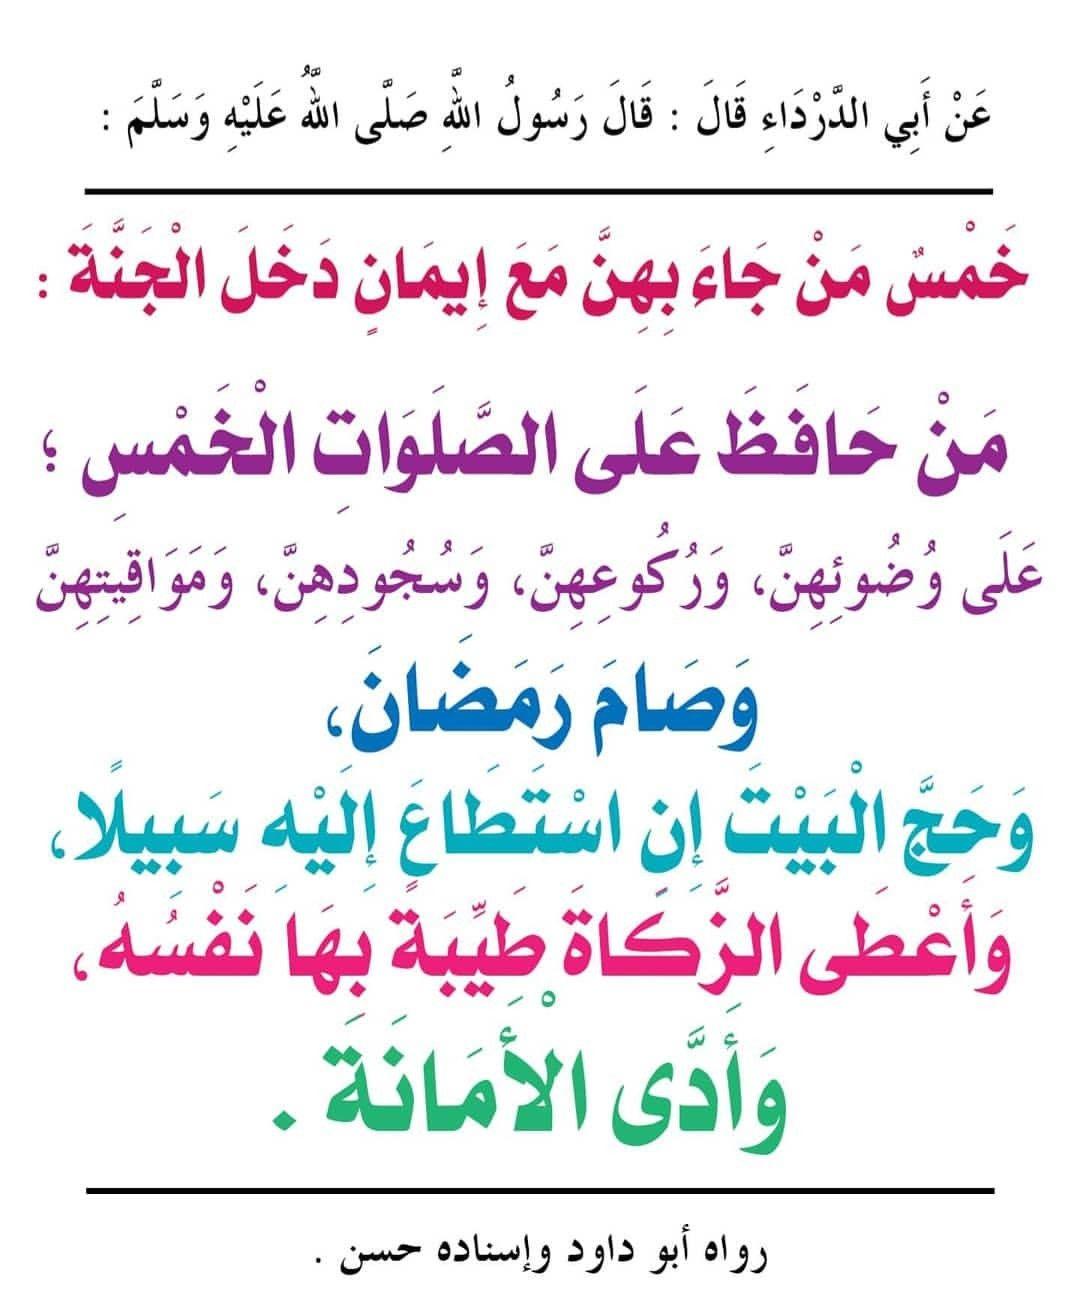 Pin By عبق الورد On أحاديث نبوية ١ Quran Verses Quotes Verses